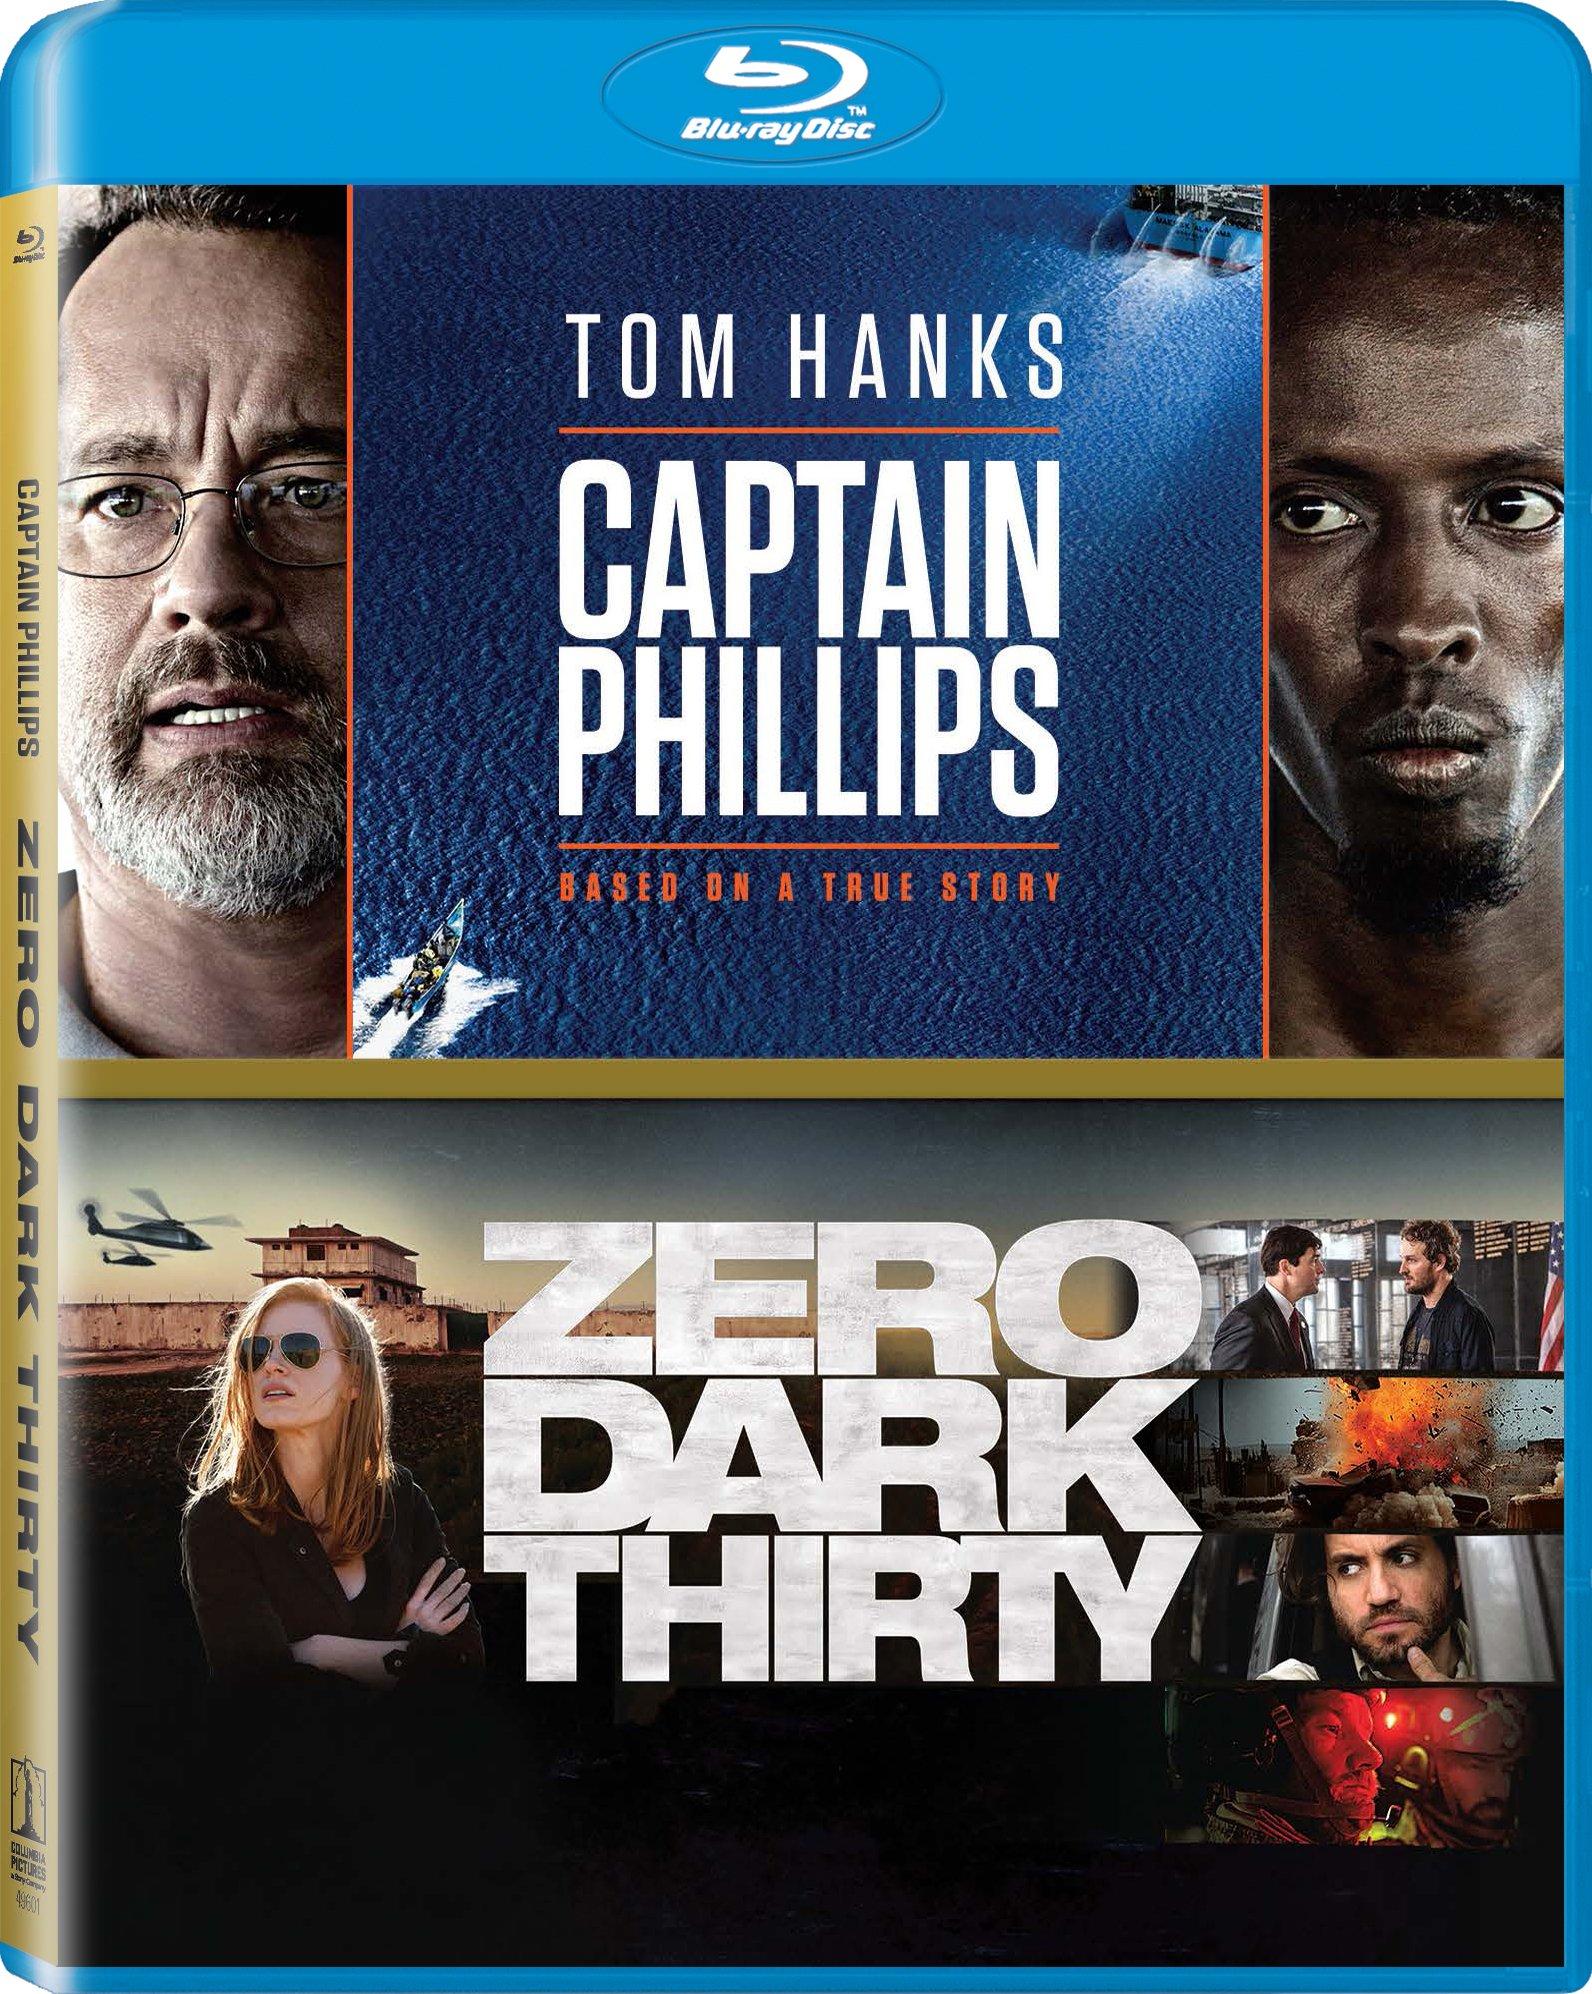 Blu-ray : Captain Phillips / Zero Dark Thirty (Widescreen, Dubbed, , 2 Pack, 2 Disc)